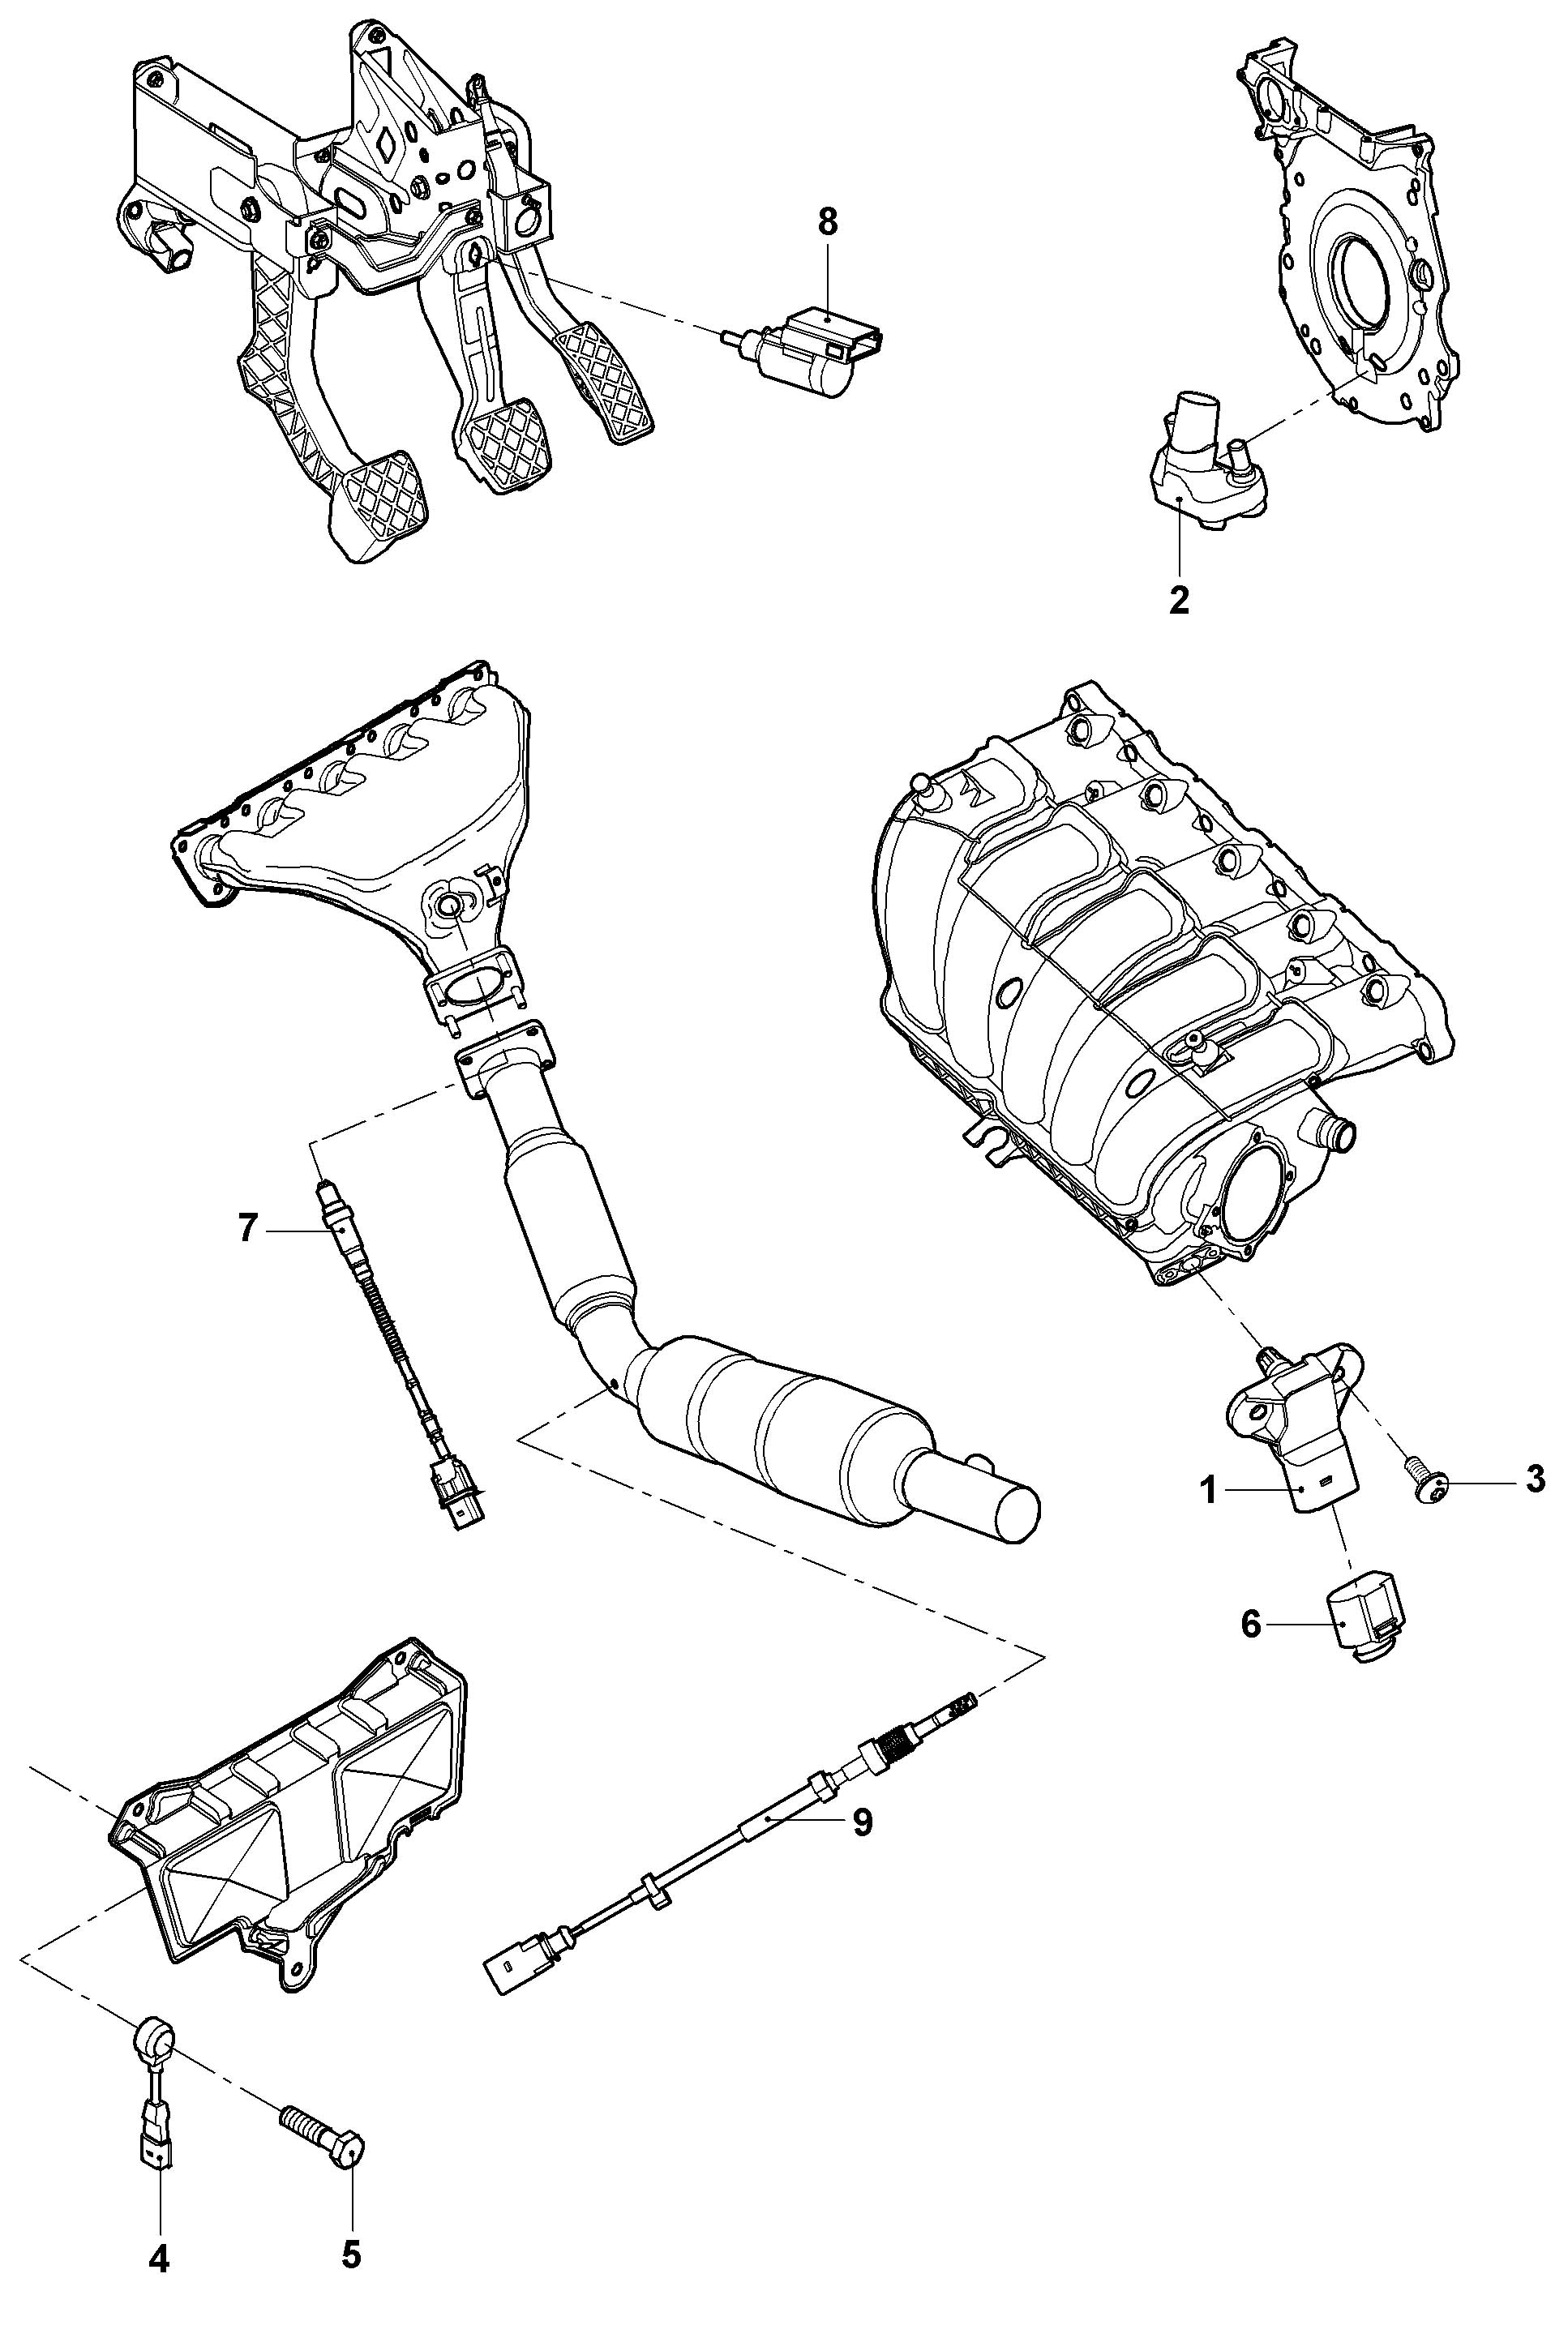 Volkswagen Jetta Variant 2.0L Repair set for lambda probe